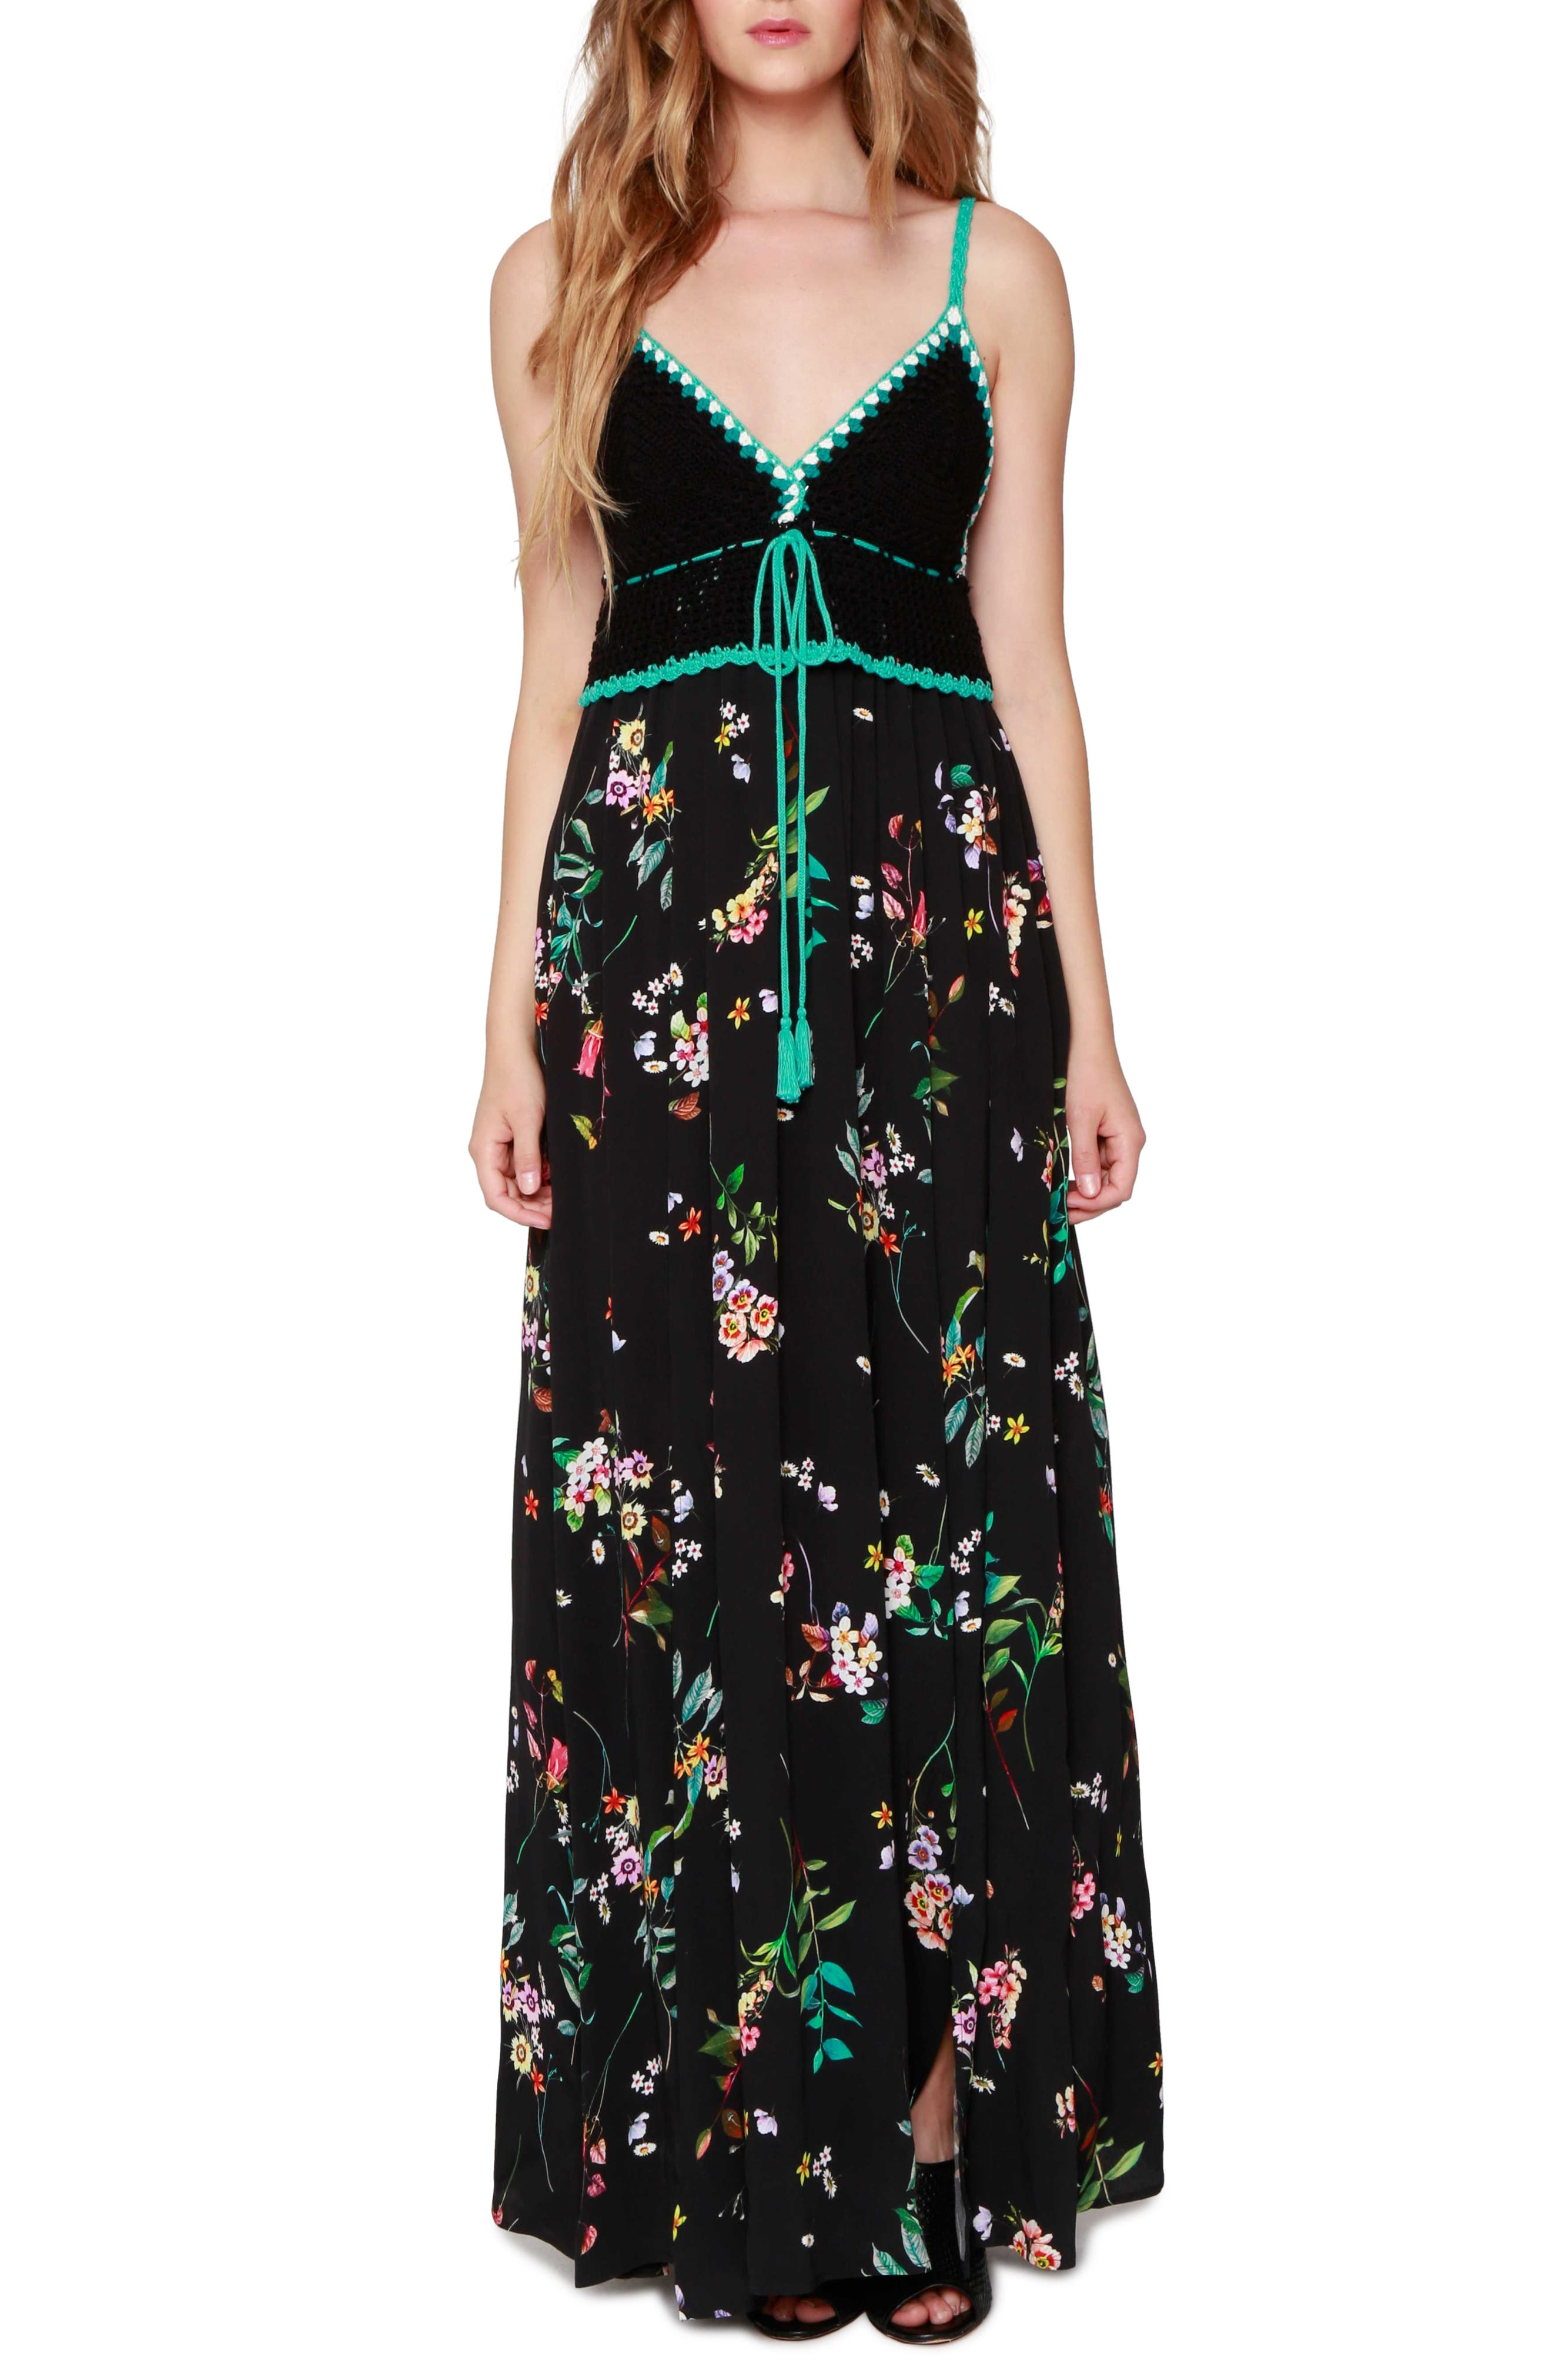 Willow & Clay Crochet Maxi Dress